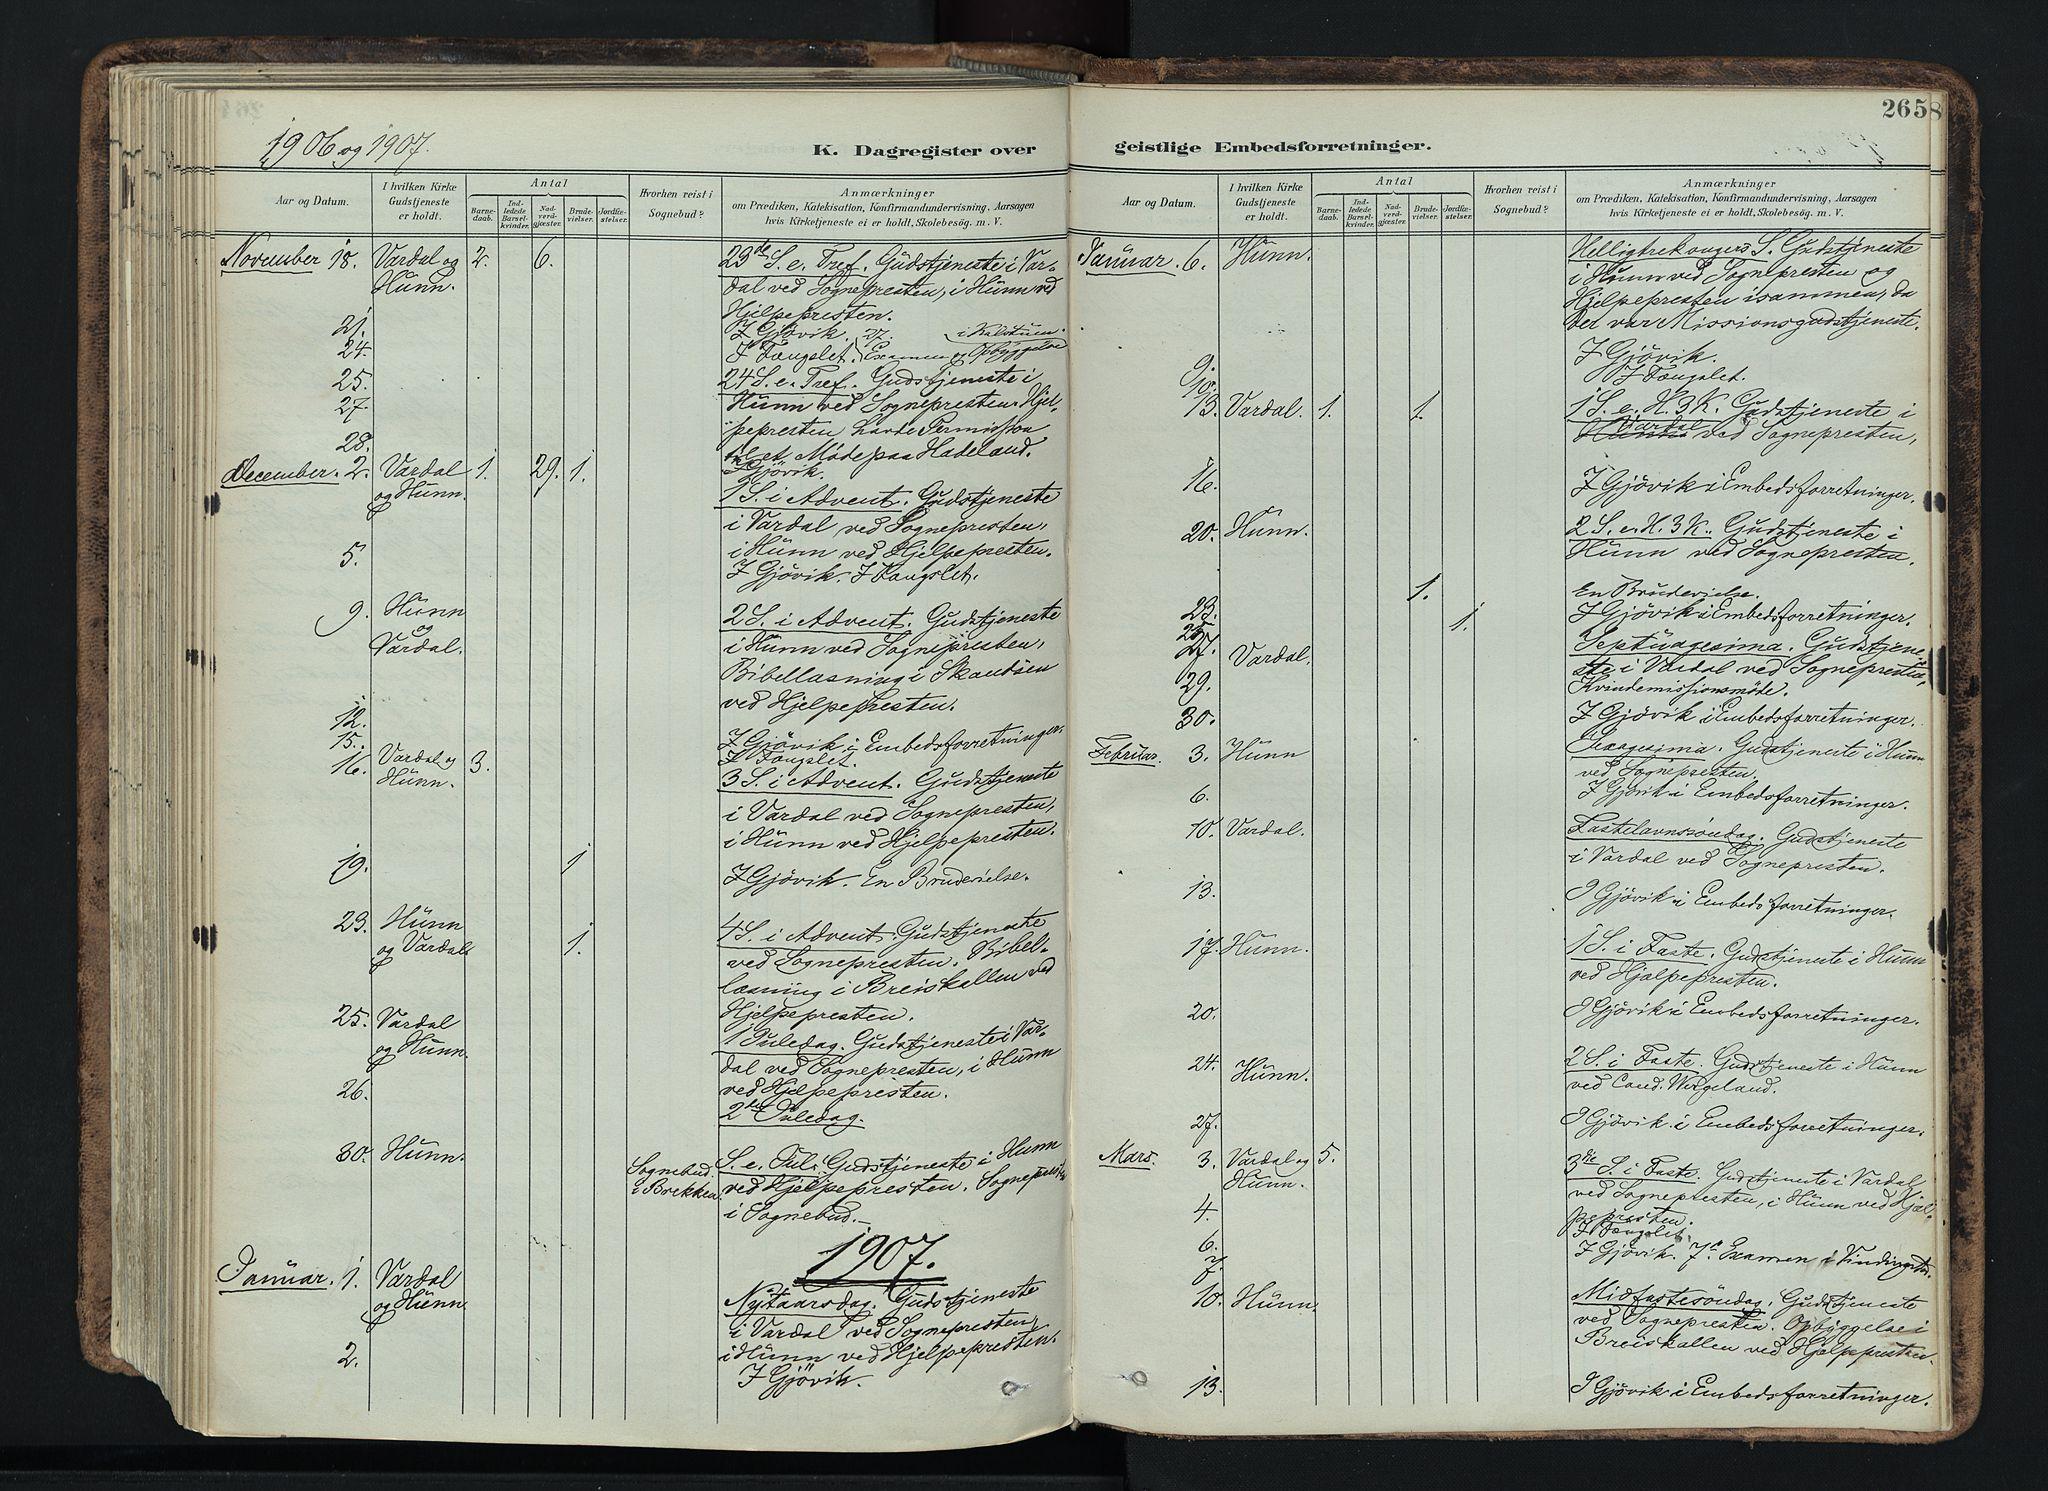 SAH, Vardal prestekontor, H/Ha/Haa/L0019: Ministerialbok nr. 19, 1893-1907, s. 265